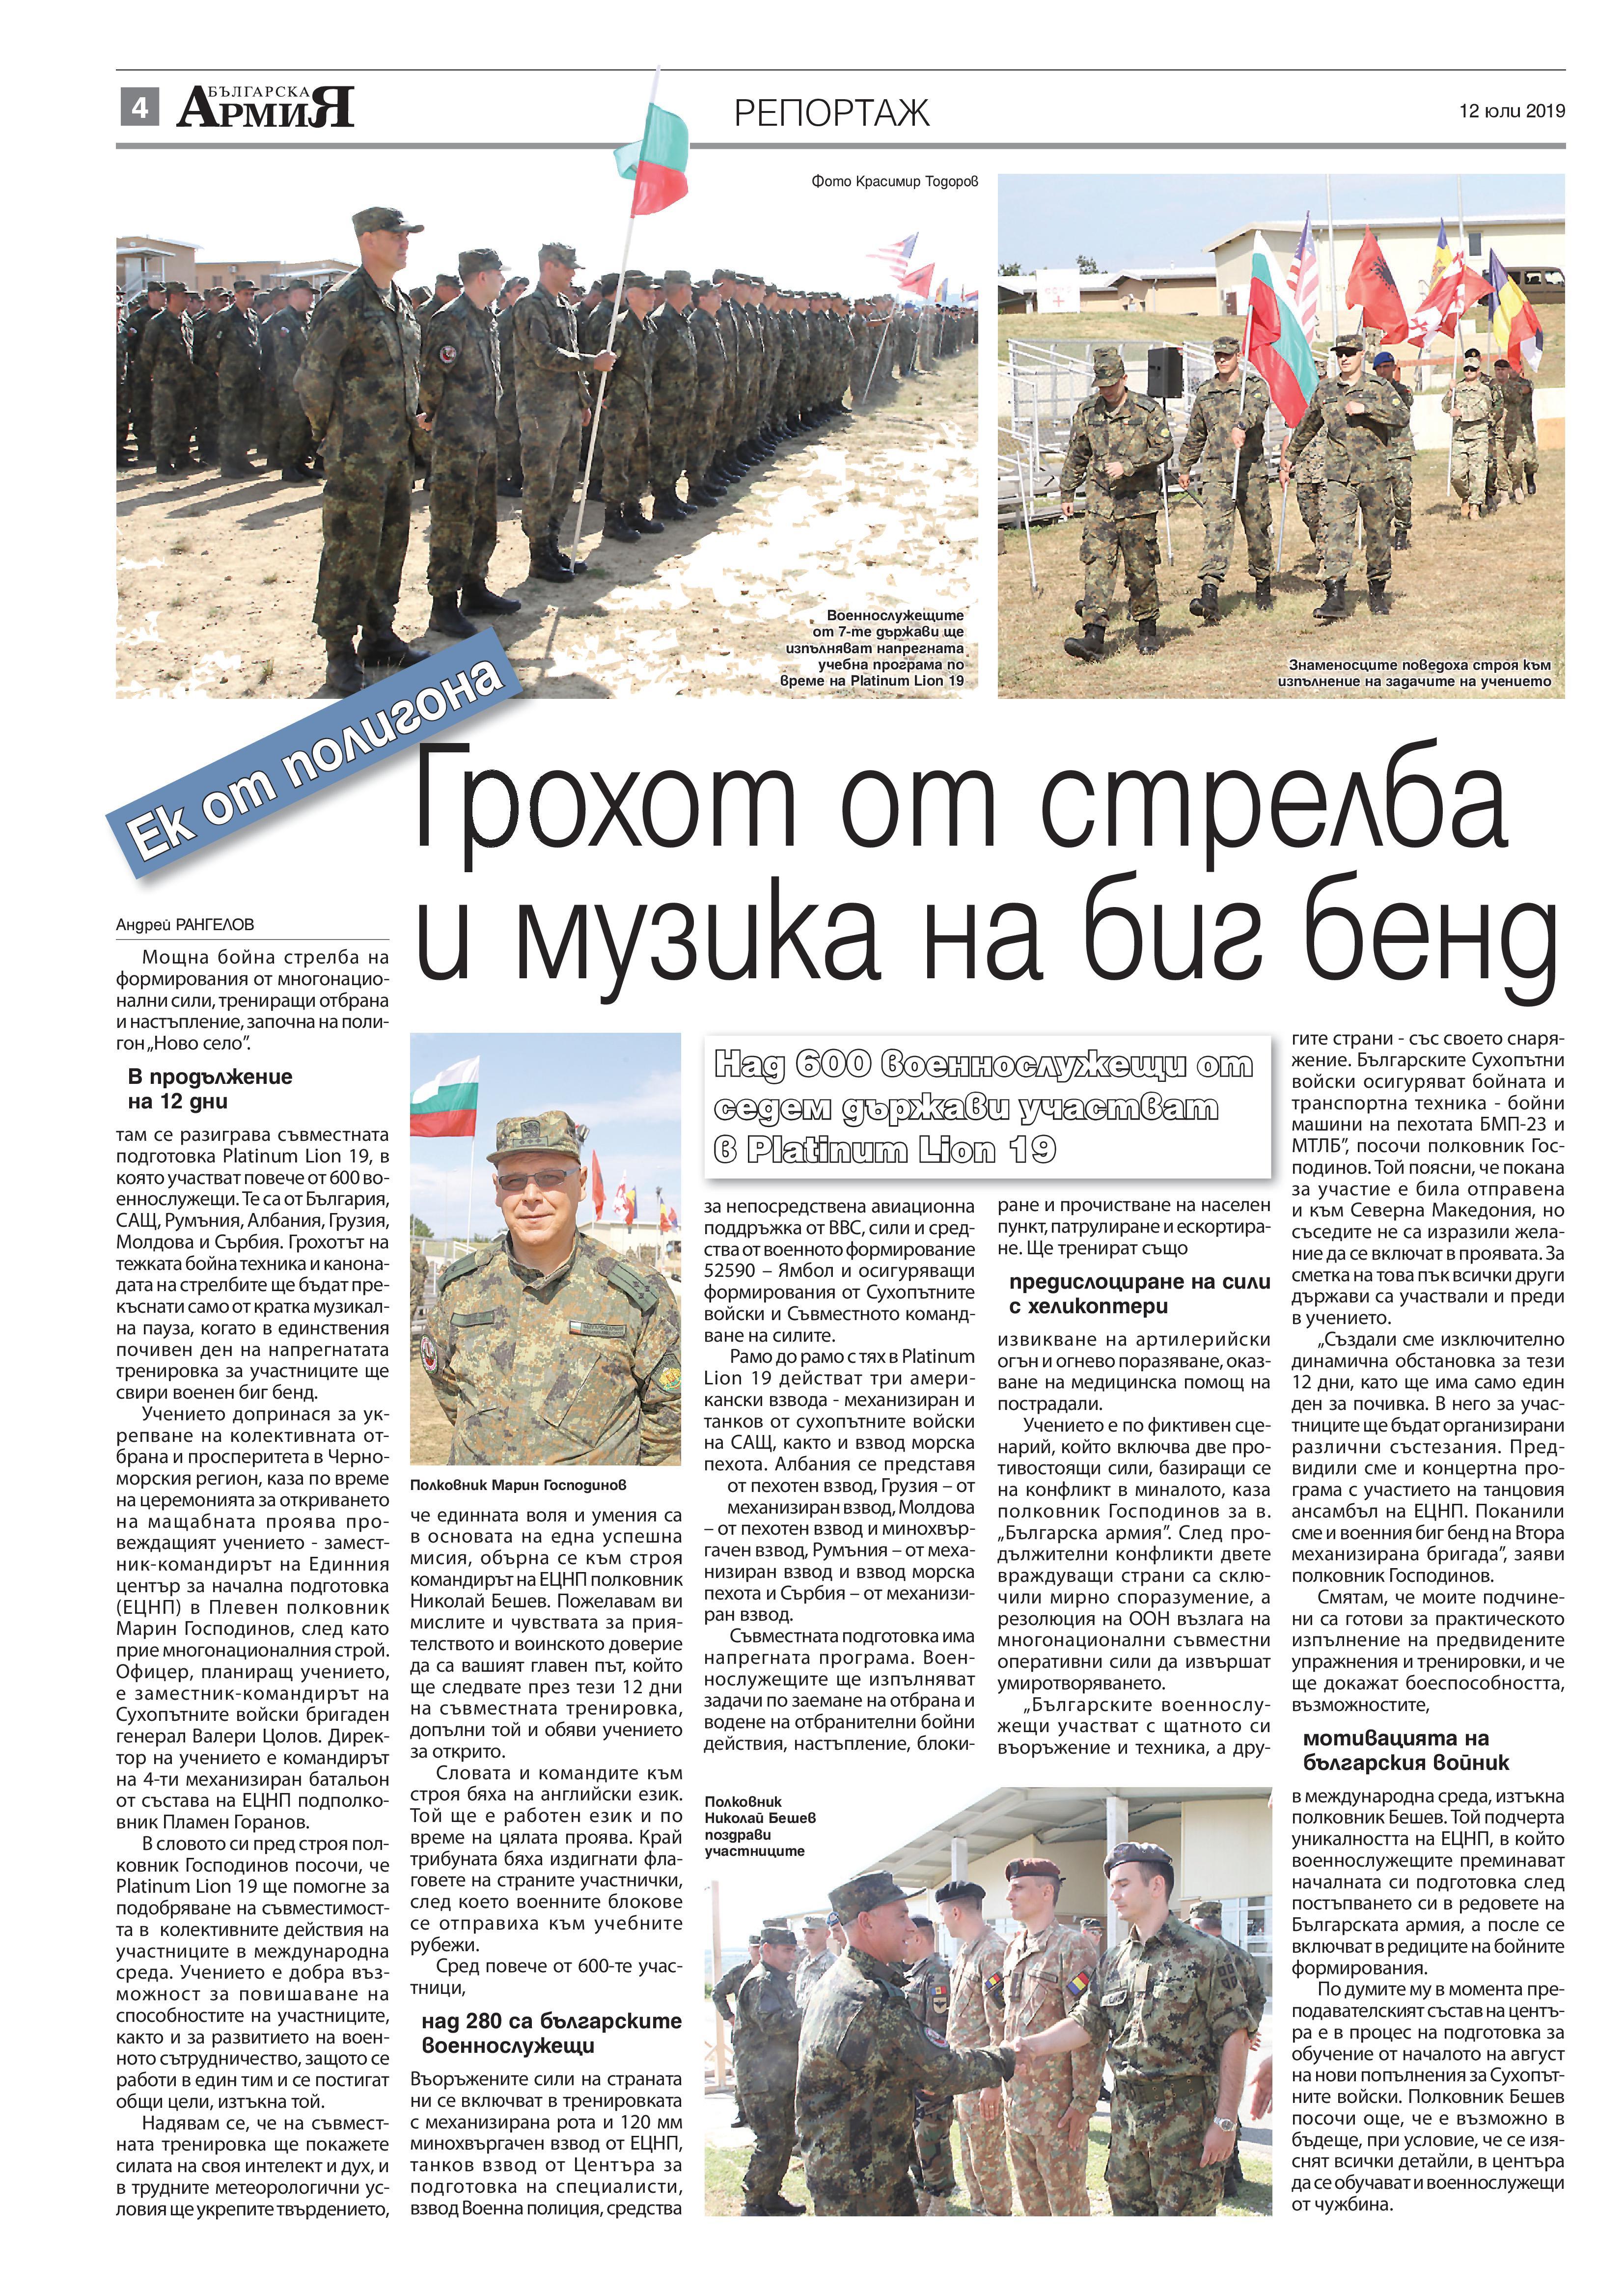 https://armymedia.bg/wp-content/uploads/2015/06/04-28.jpg